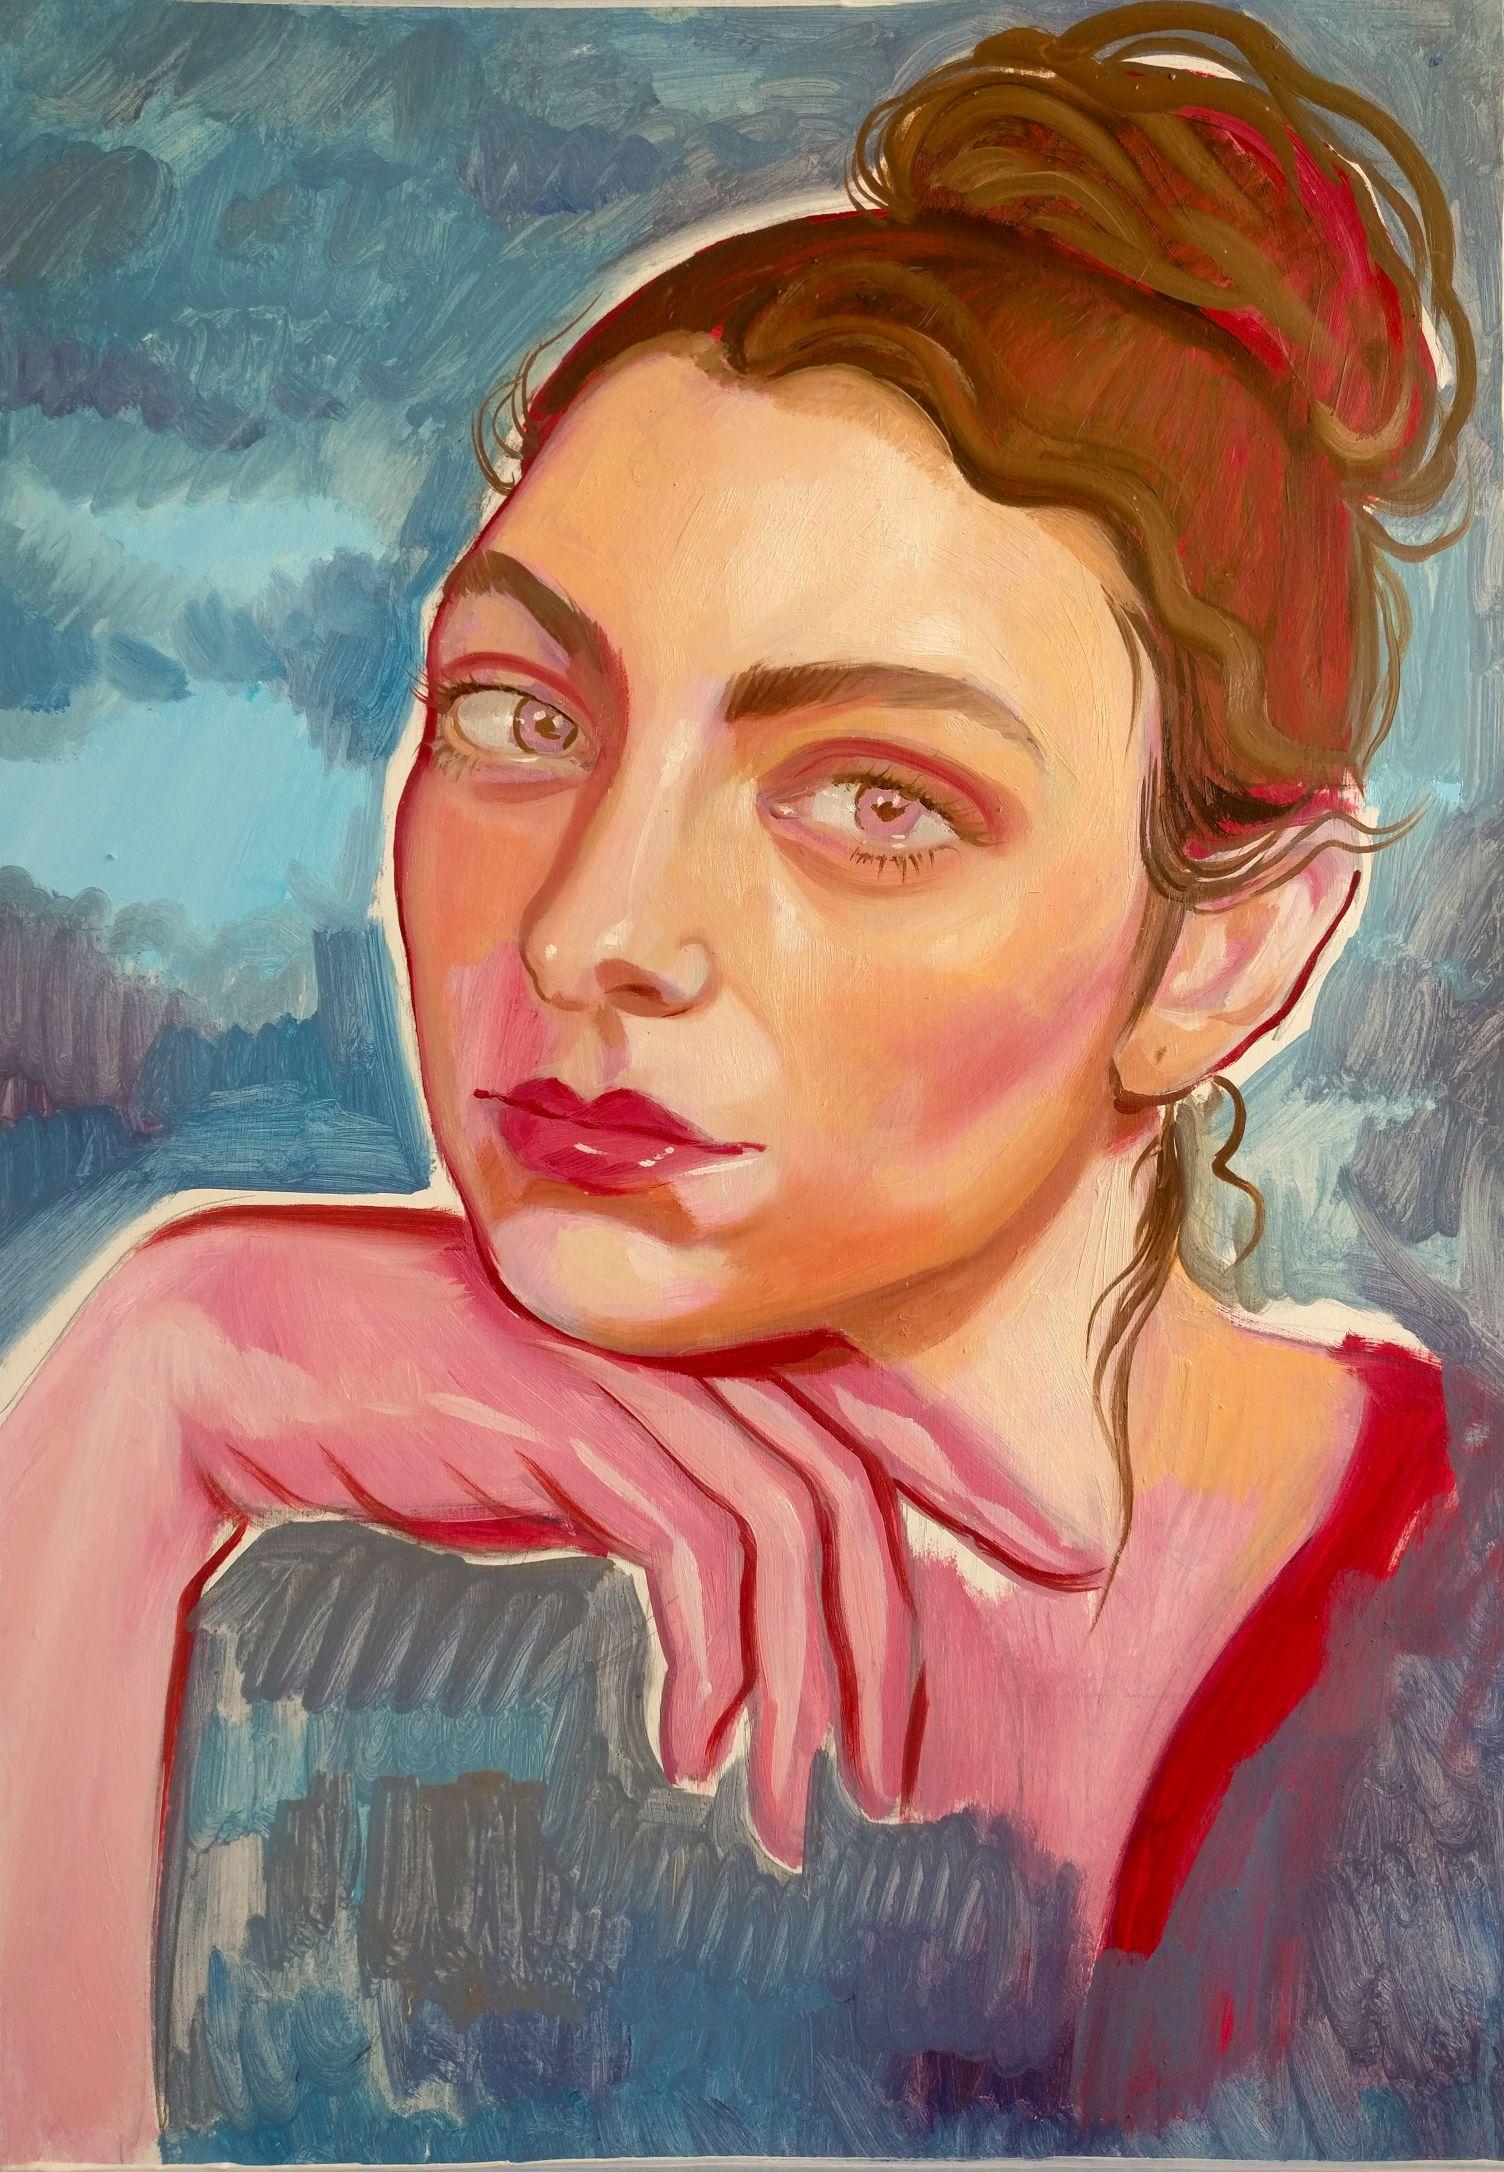 To My Twenties - Lot 4, Mary Savva, Self-Portrait (Pink Hand Pink Eyes)